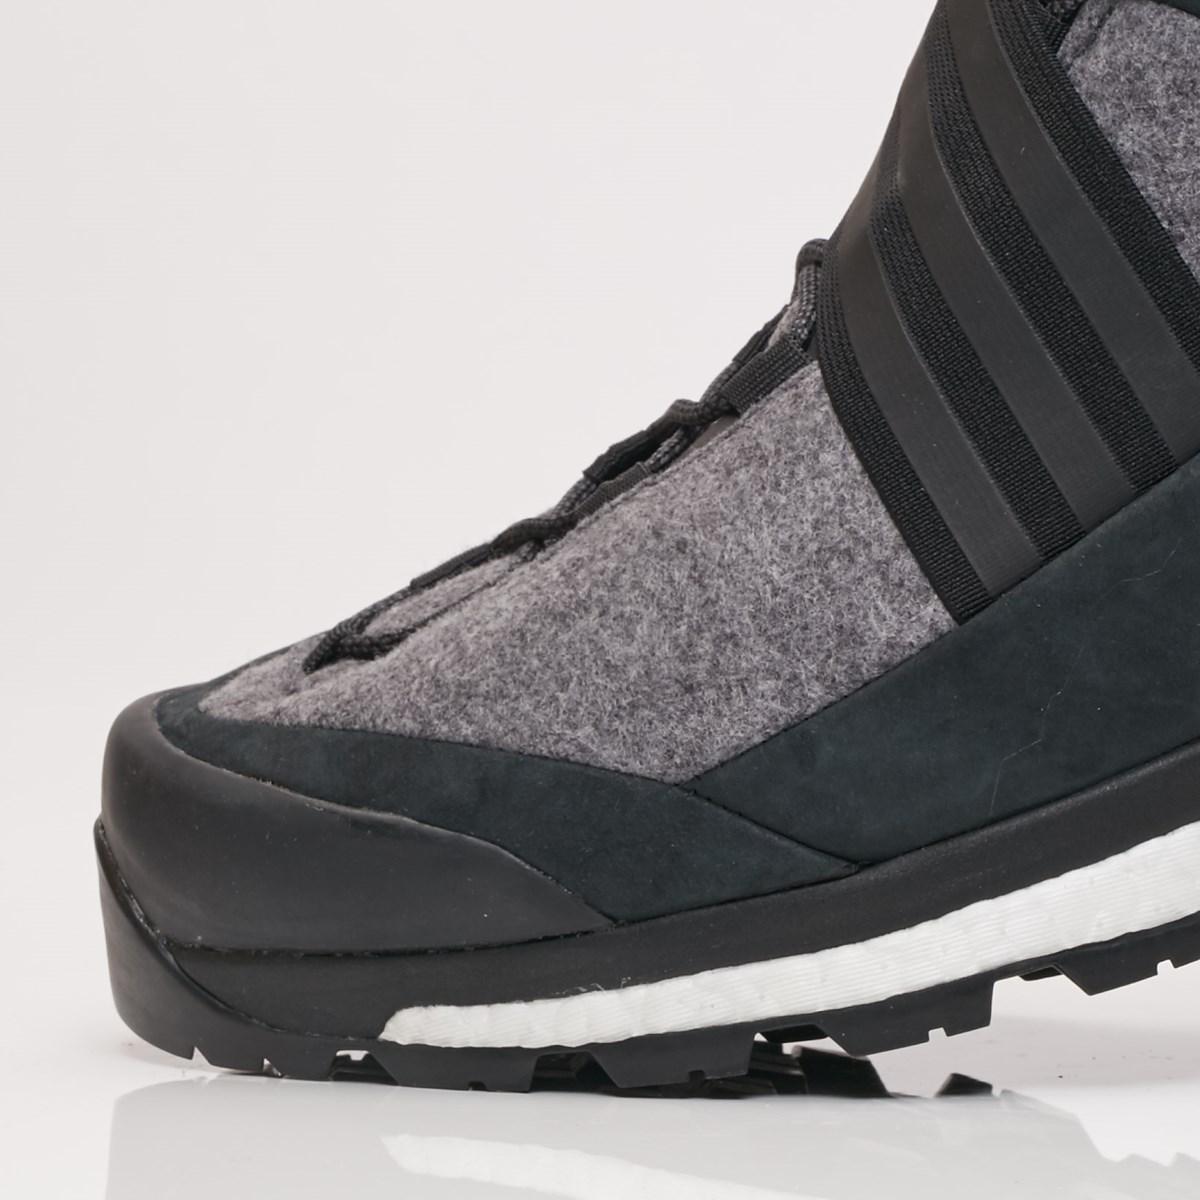 low priced 18cbe dc536 adidas Terrex Tracefinder x XHIBITION - Cm7881 - Sneakersnstuff   sneakers    streetwear online since 1999